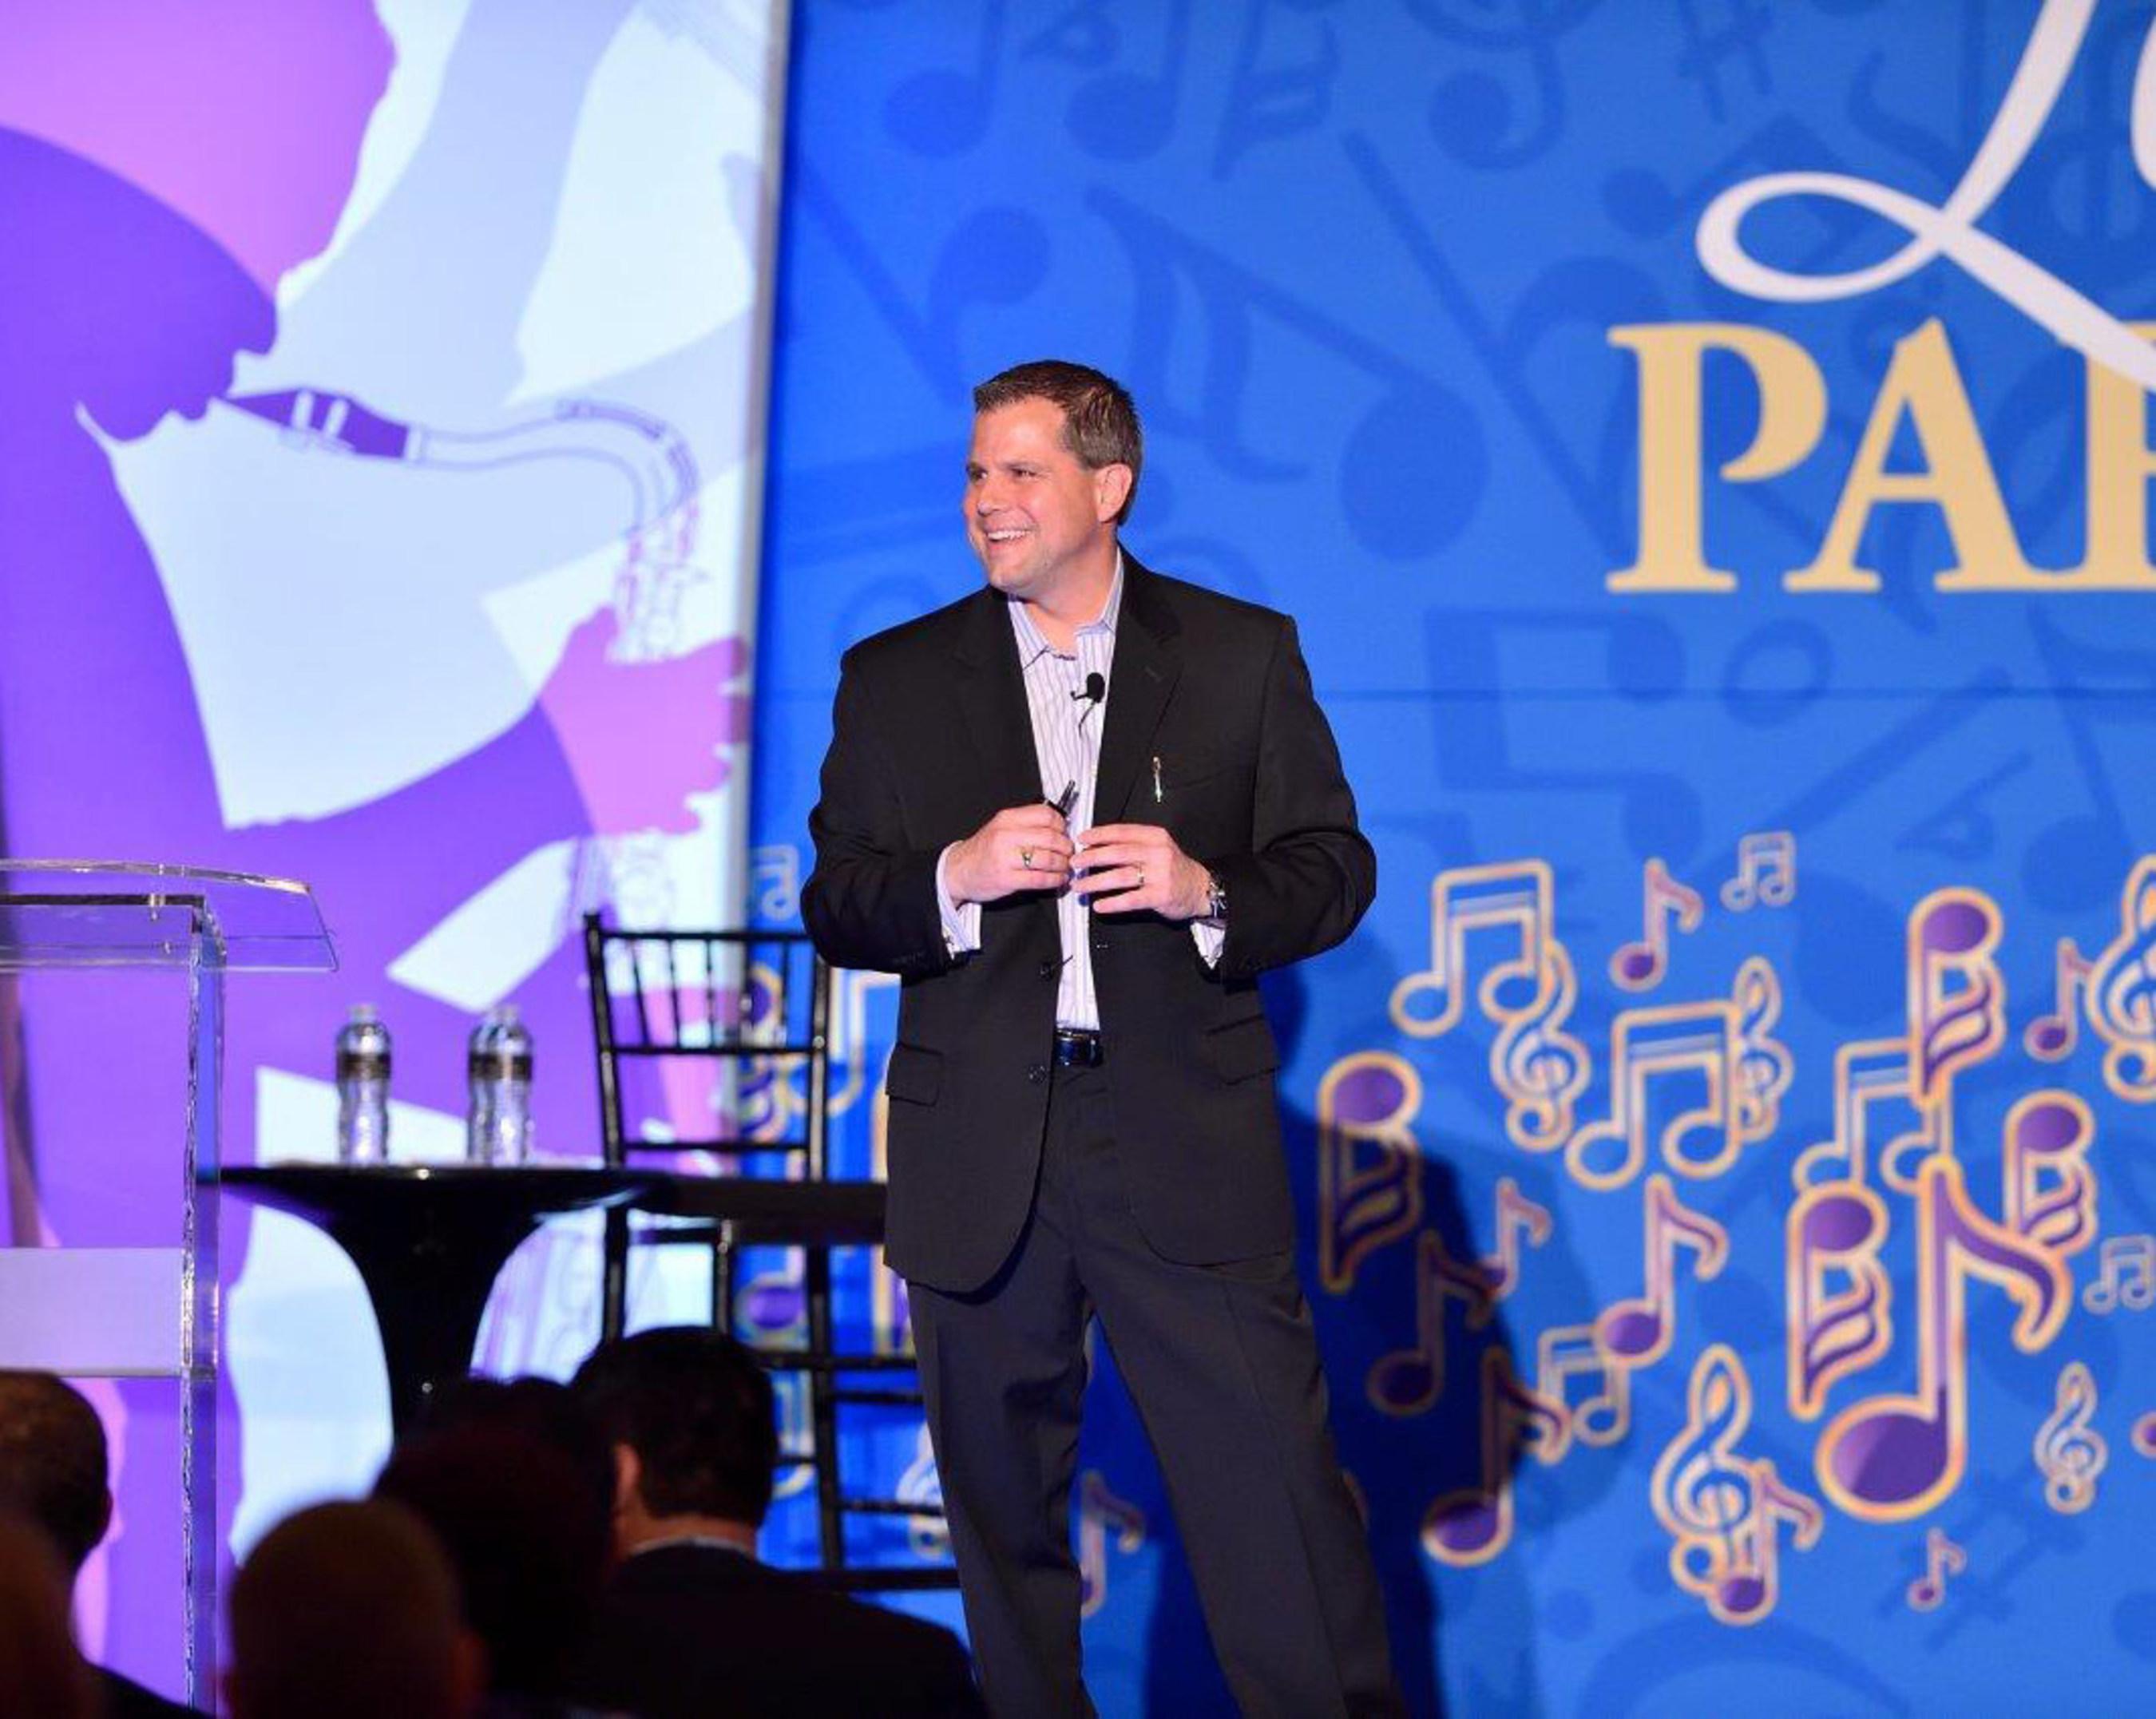 Scott Collins, senior vice president, Employer Services for Equifax, hosts FORUM 2015.